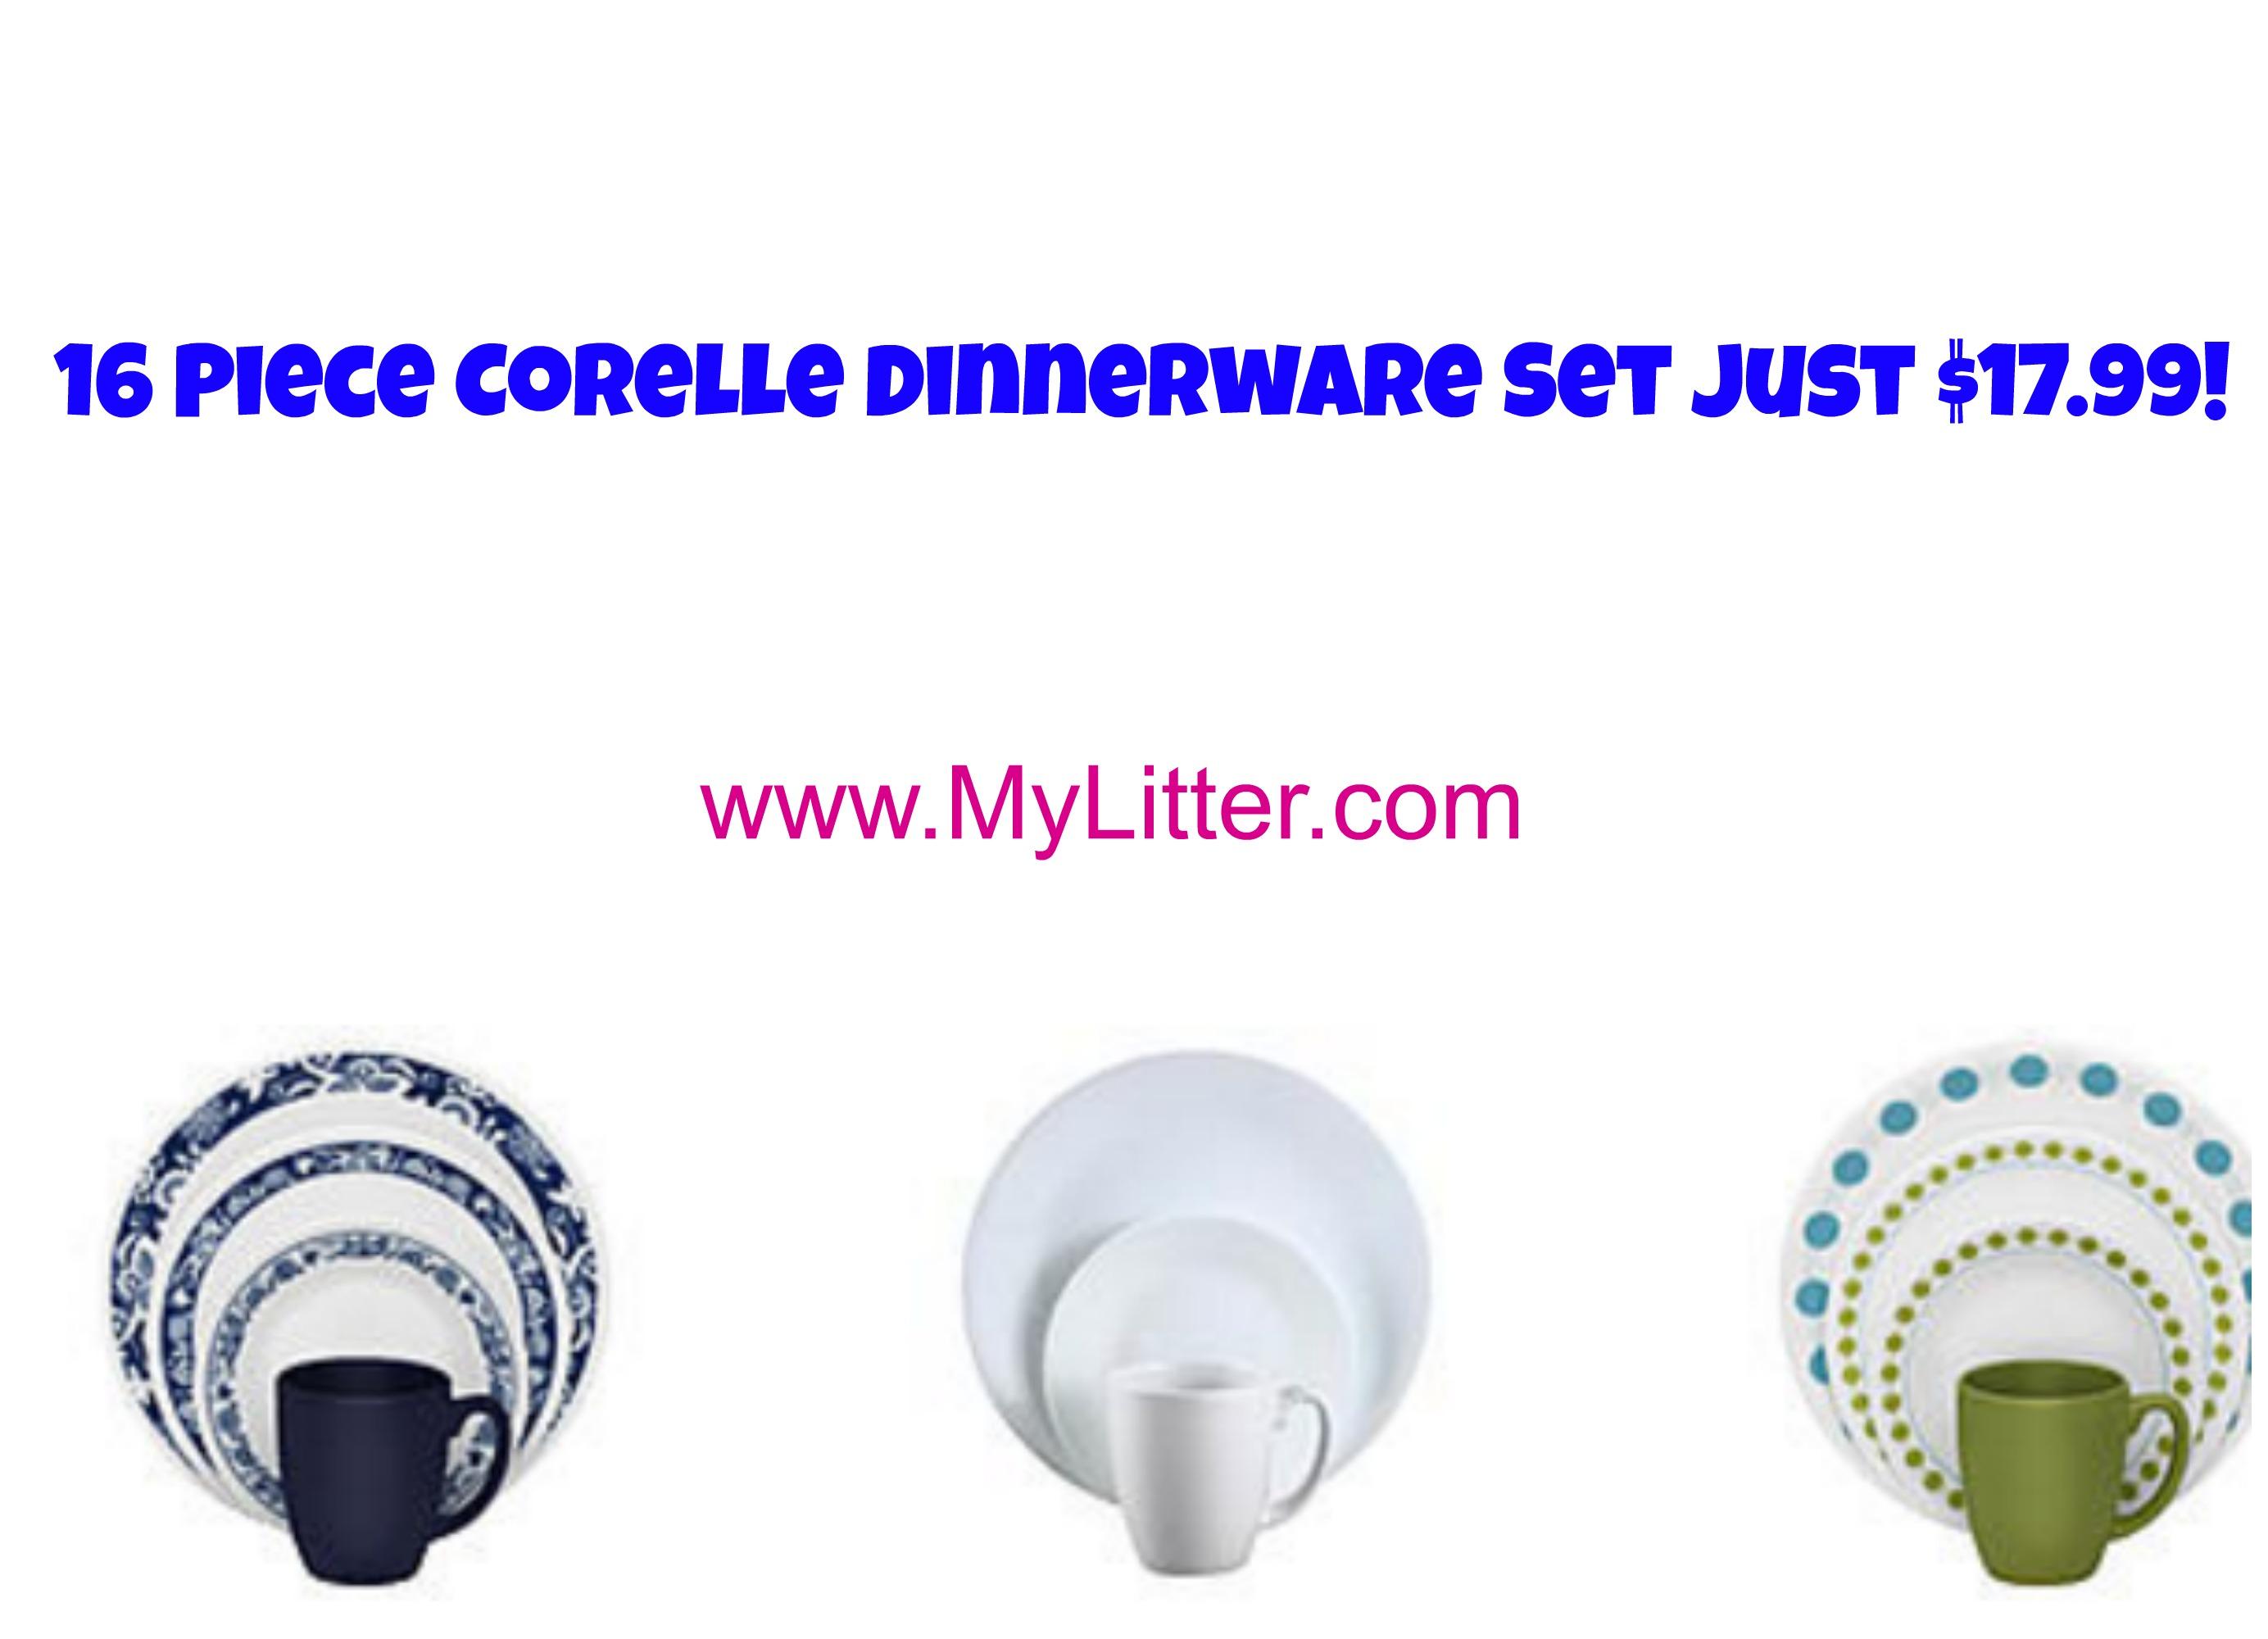 corellekmart  sc 1 st  MyLitter & Kmart: Corelle 16 pc Dinnerware Set Just $18 Reg $40! - MyLitter ...